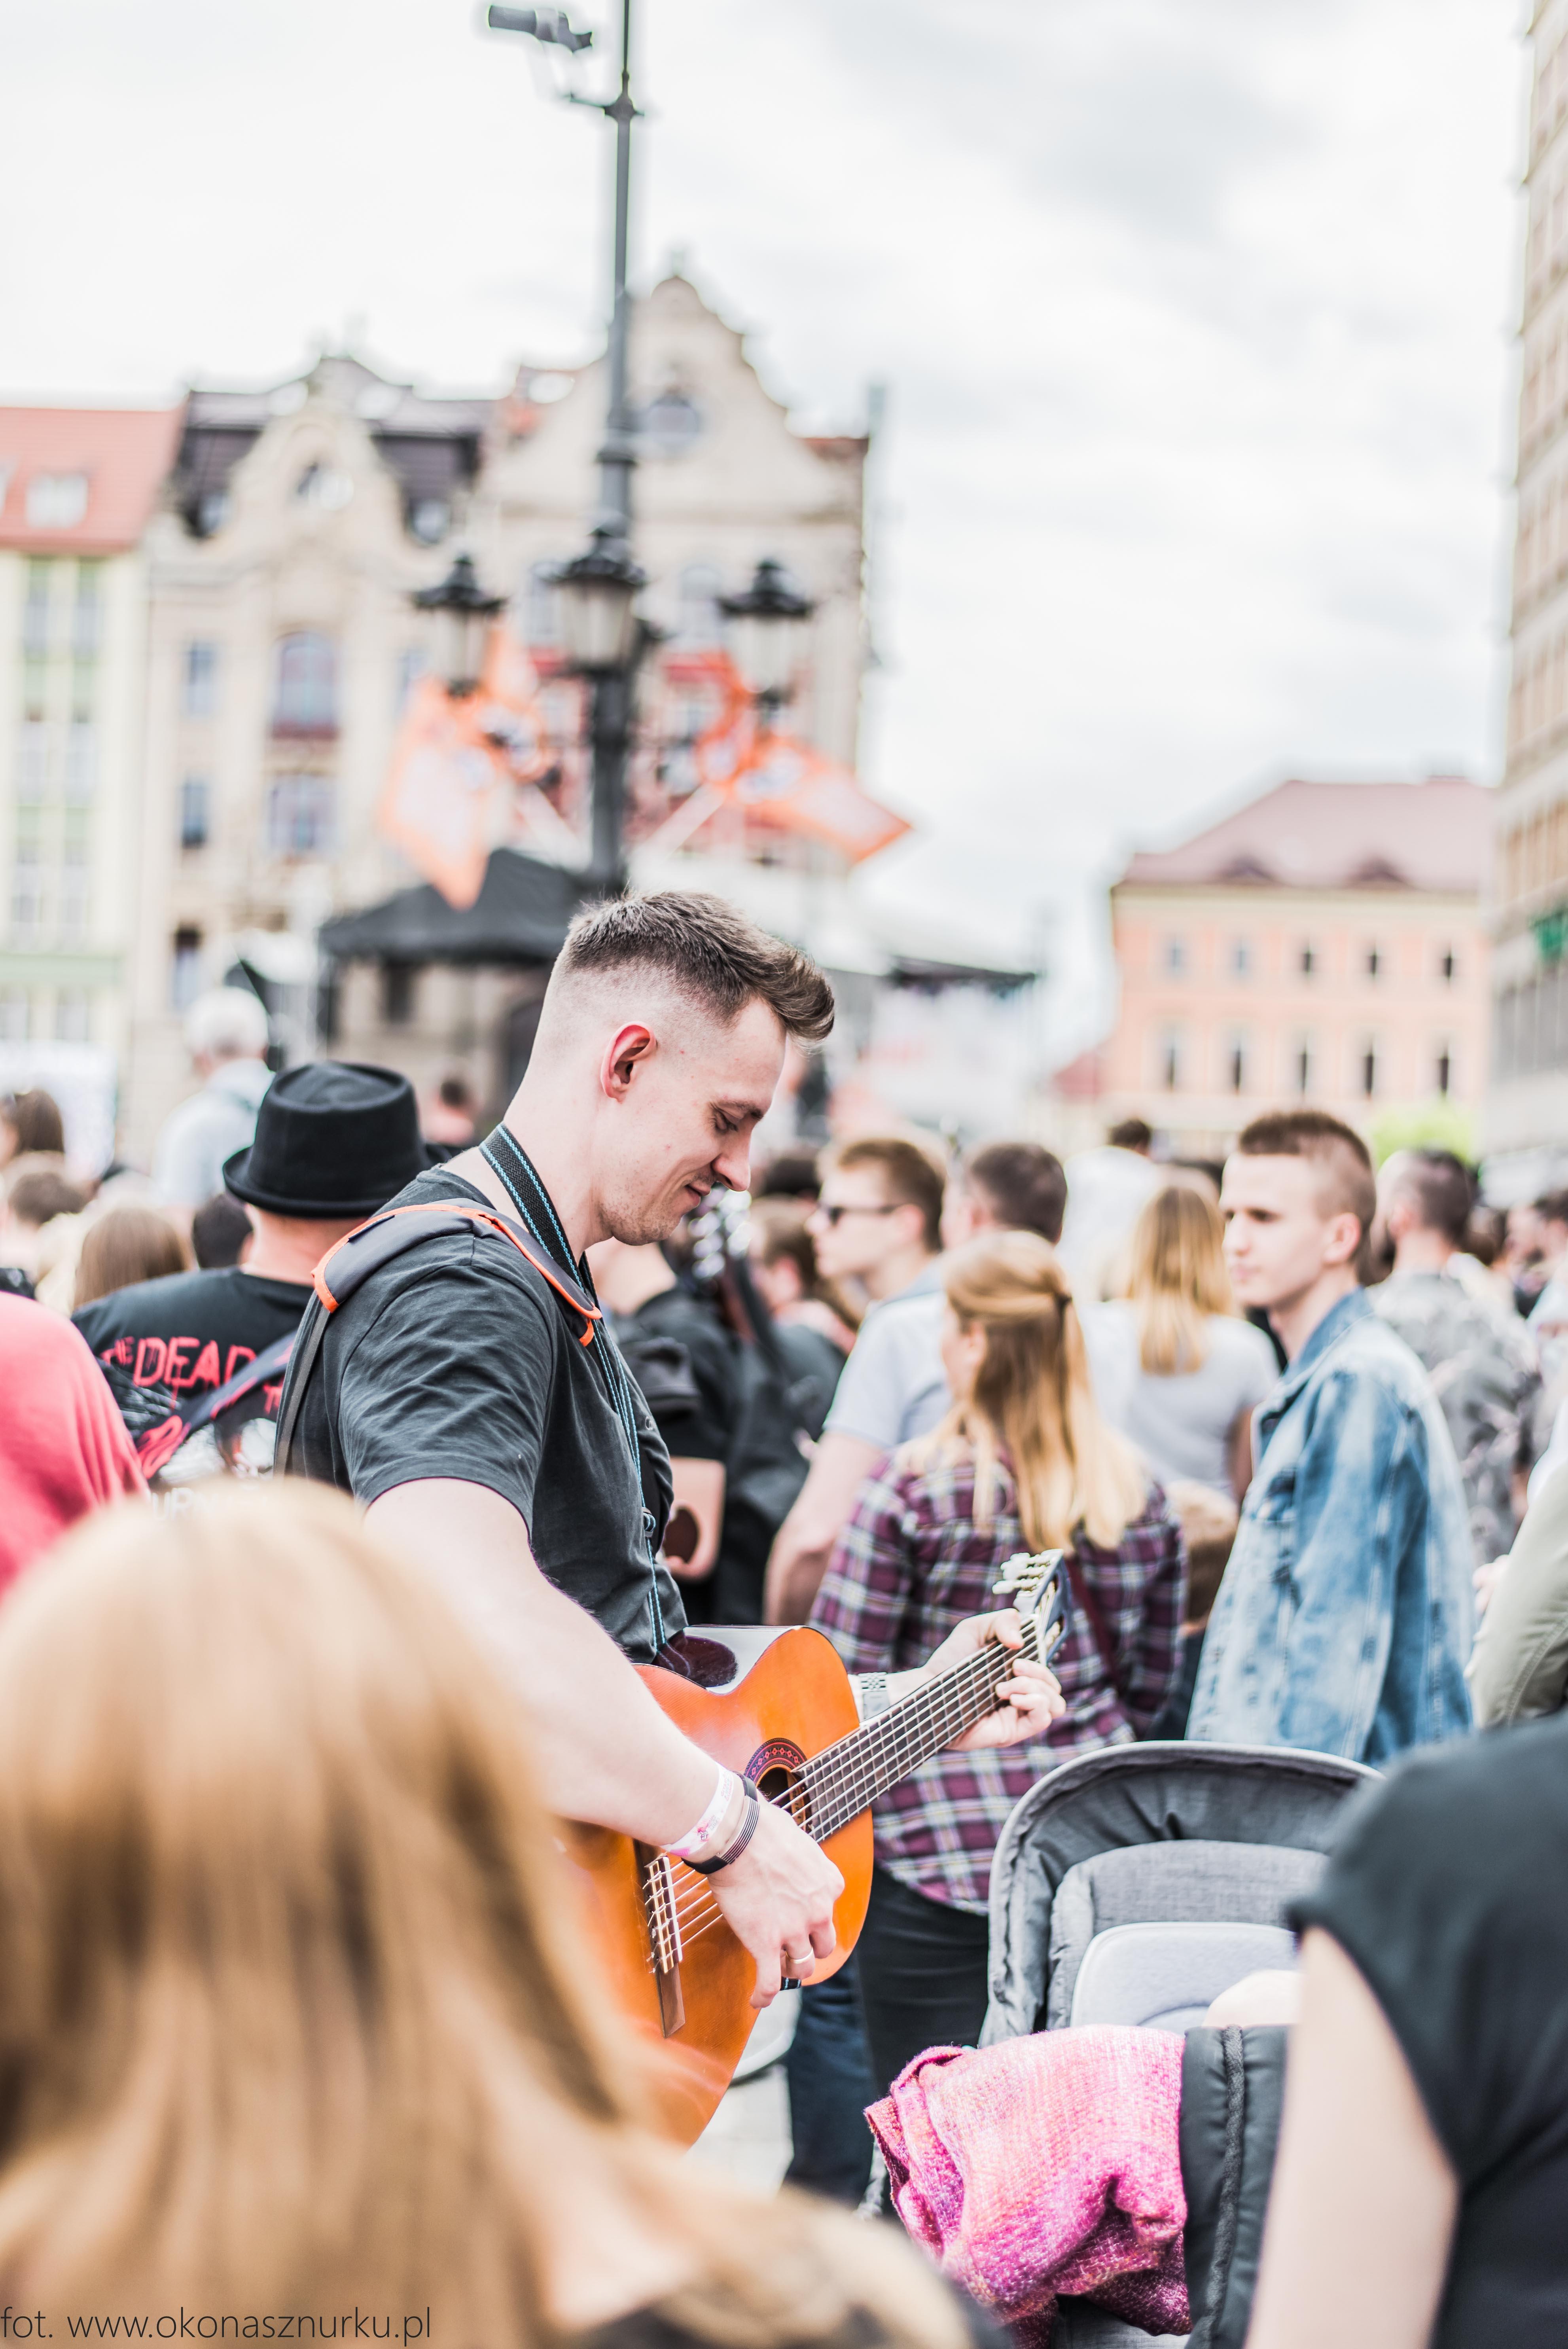 wroclawski-gitarowy-rekord-guinnessa-2018 (5)